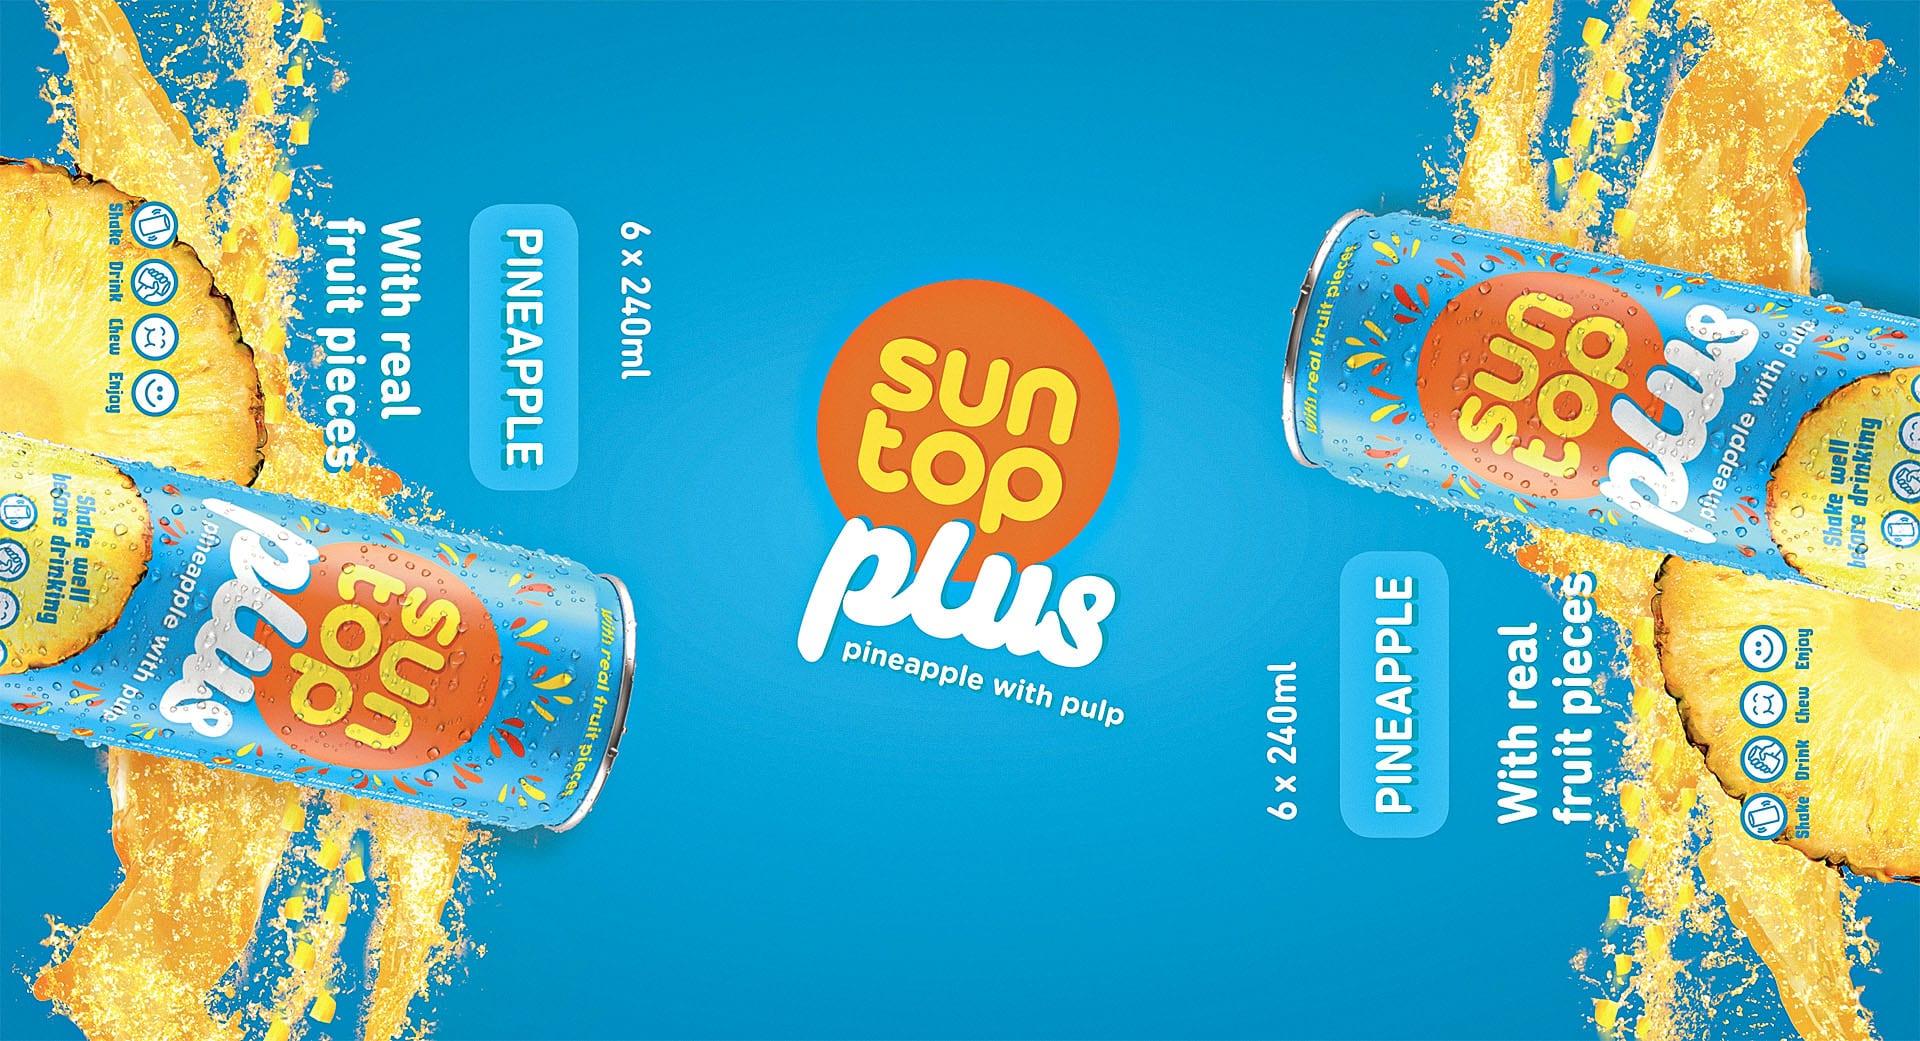 Suntop_6-pack_pineapple_01